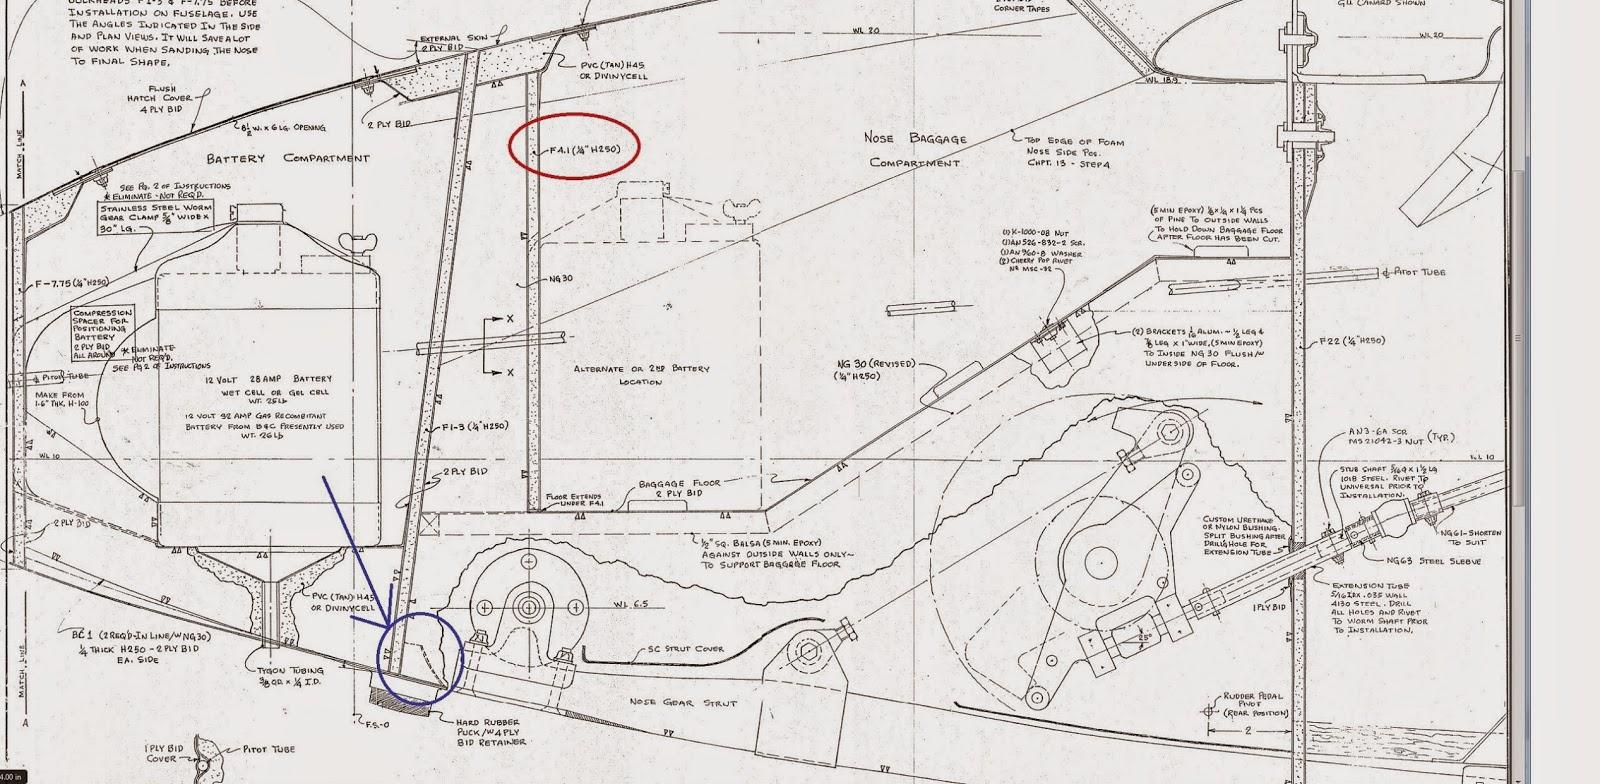 2002 ez go txt wiring diagram directv satellite dish 1997 ezgo workhorse 95